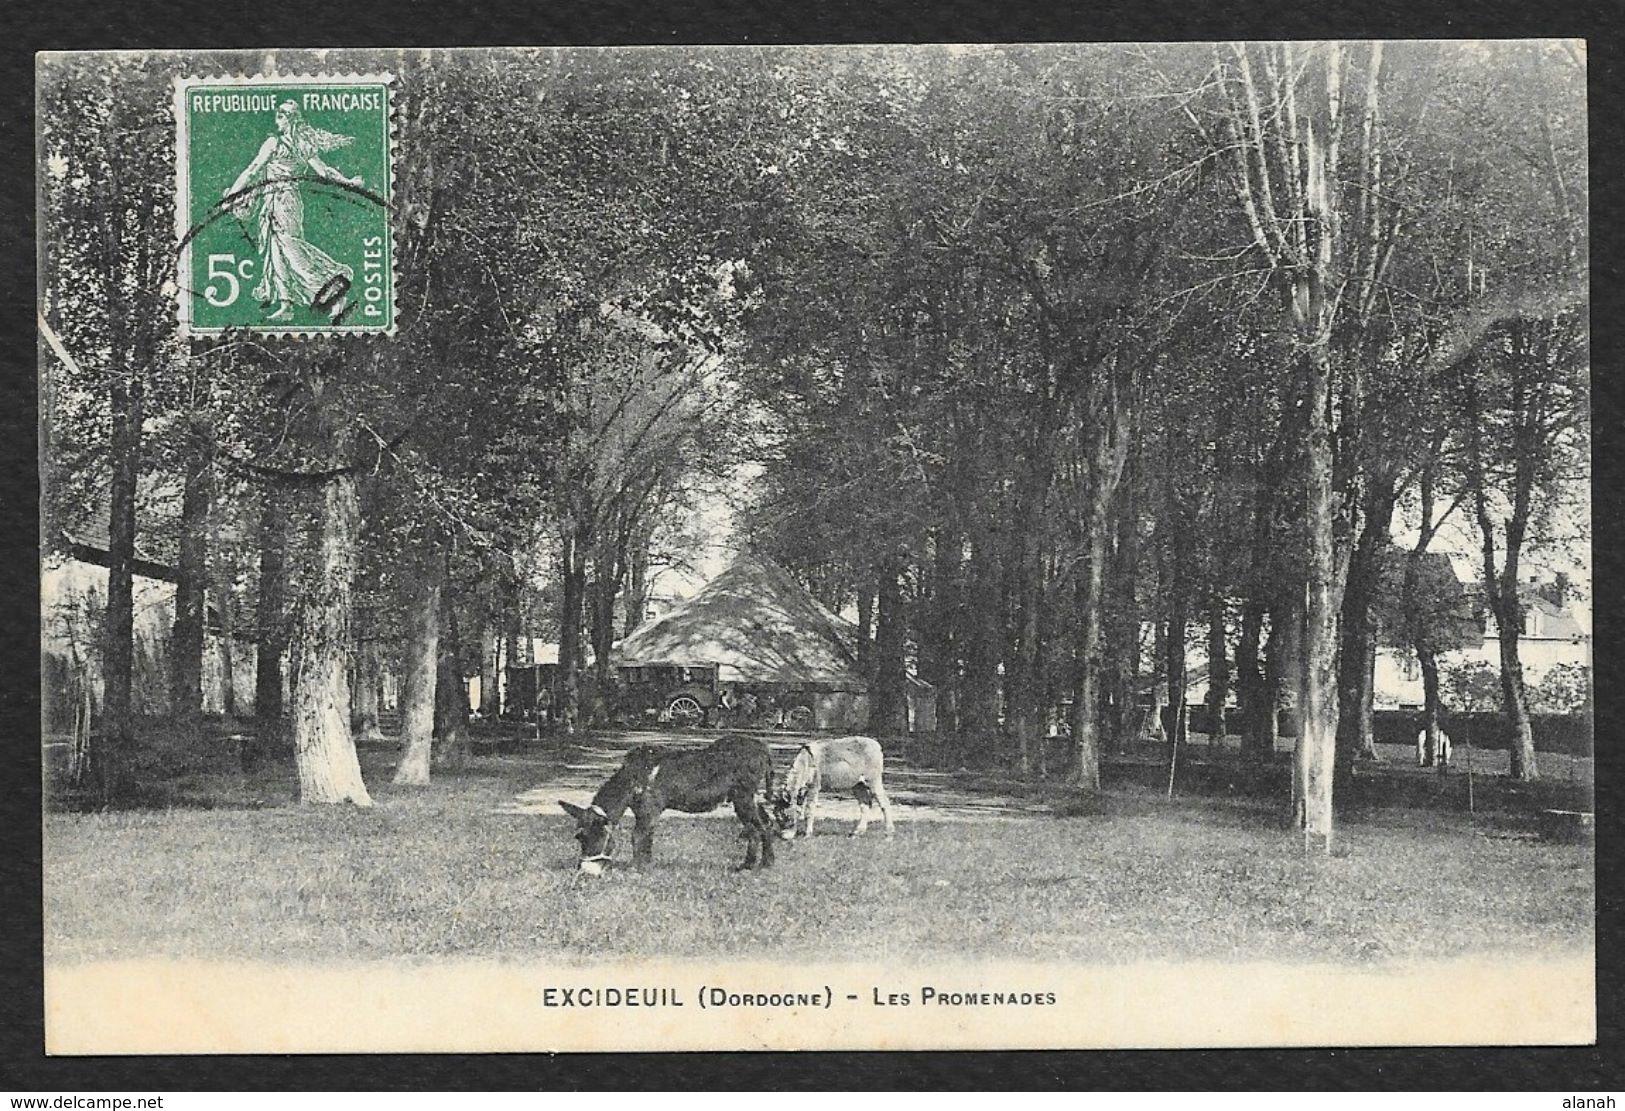 EXCIDEUIL Rare Les Promenades Anes () Dordogne (24) - Other Municipalities